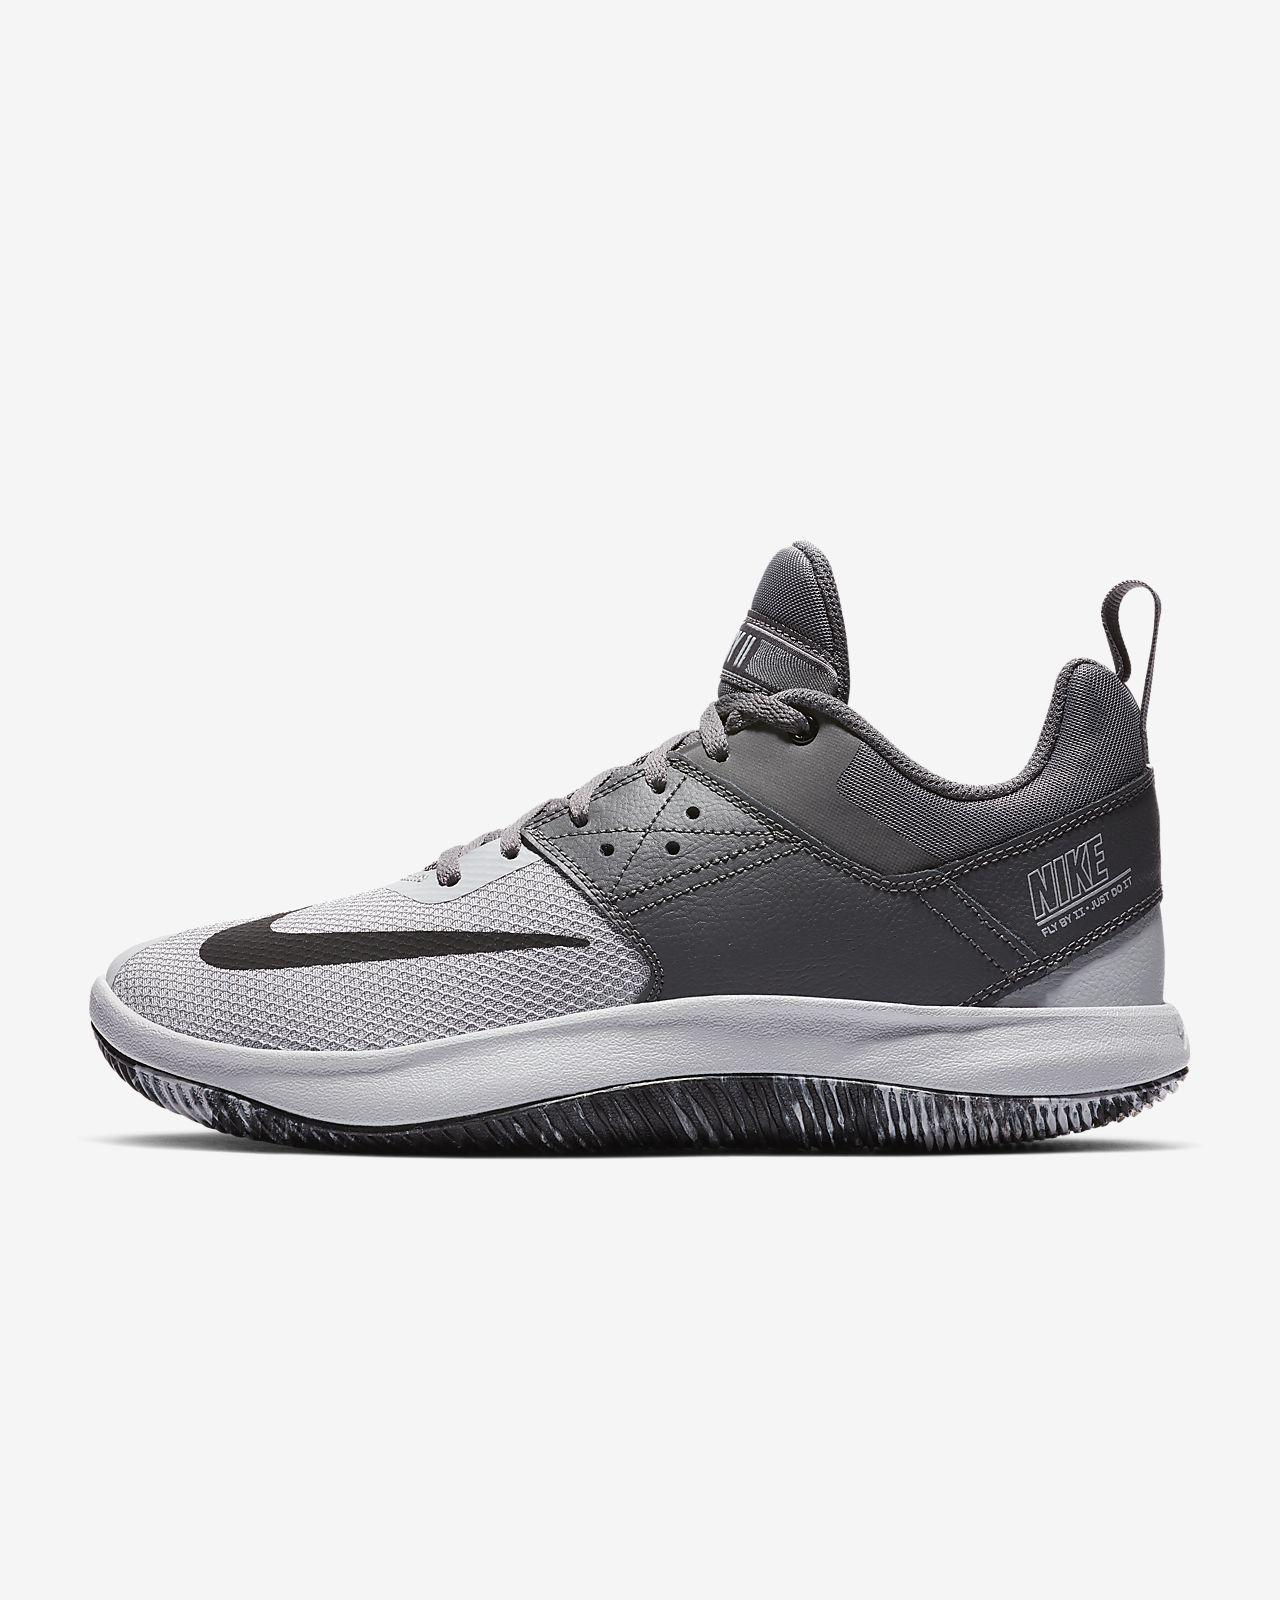 Nike Fly.By Low II Basketball Shoe